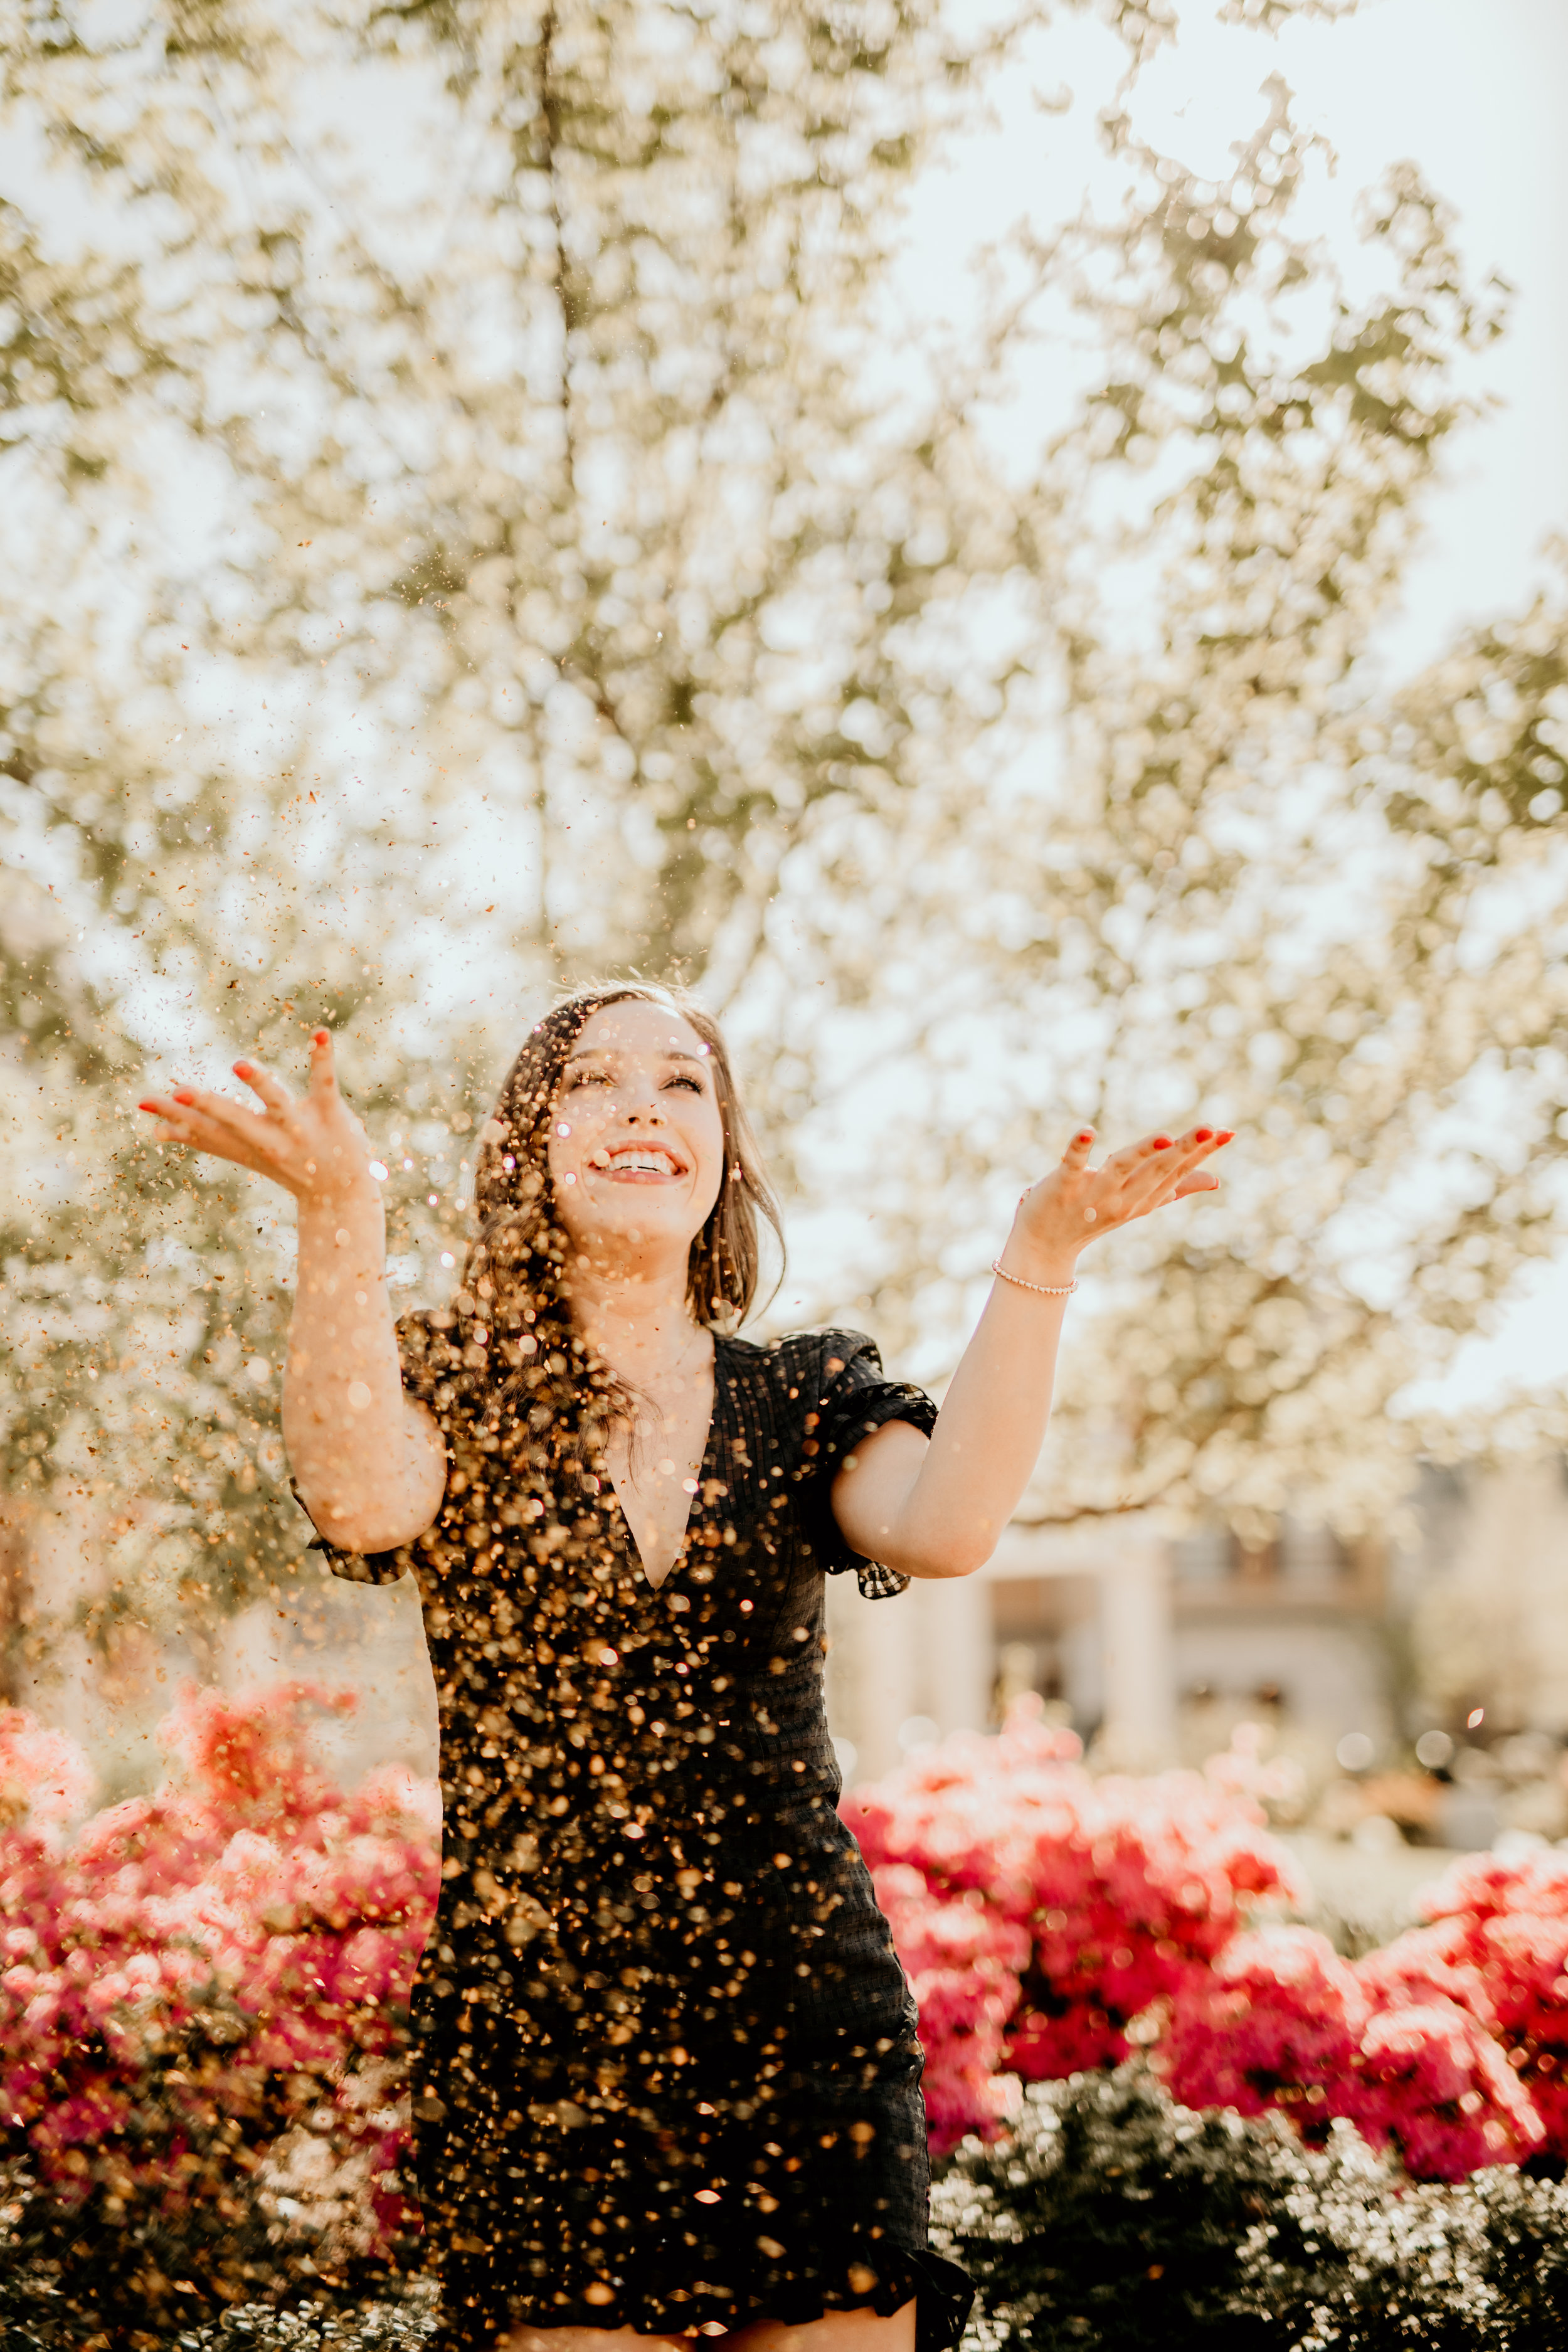 HARDING-UNIVERSITY-SENIOR-conway-central-arkansas-bridal-photographer-little-rock-photography-outdoor-wedding-boho-fashion-engagement-elopement-bouquet-bride-soiree-magazine-photoshoot-arkansasbride-pinnacle-mountain-car-vintage